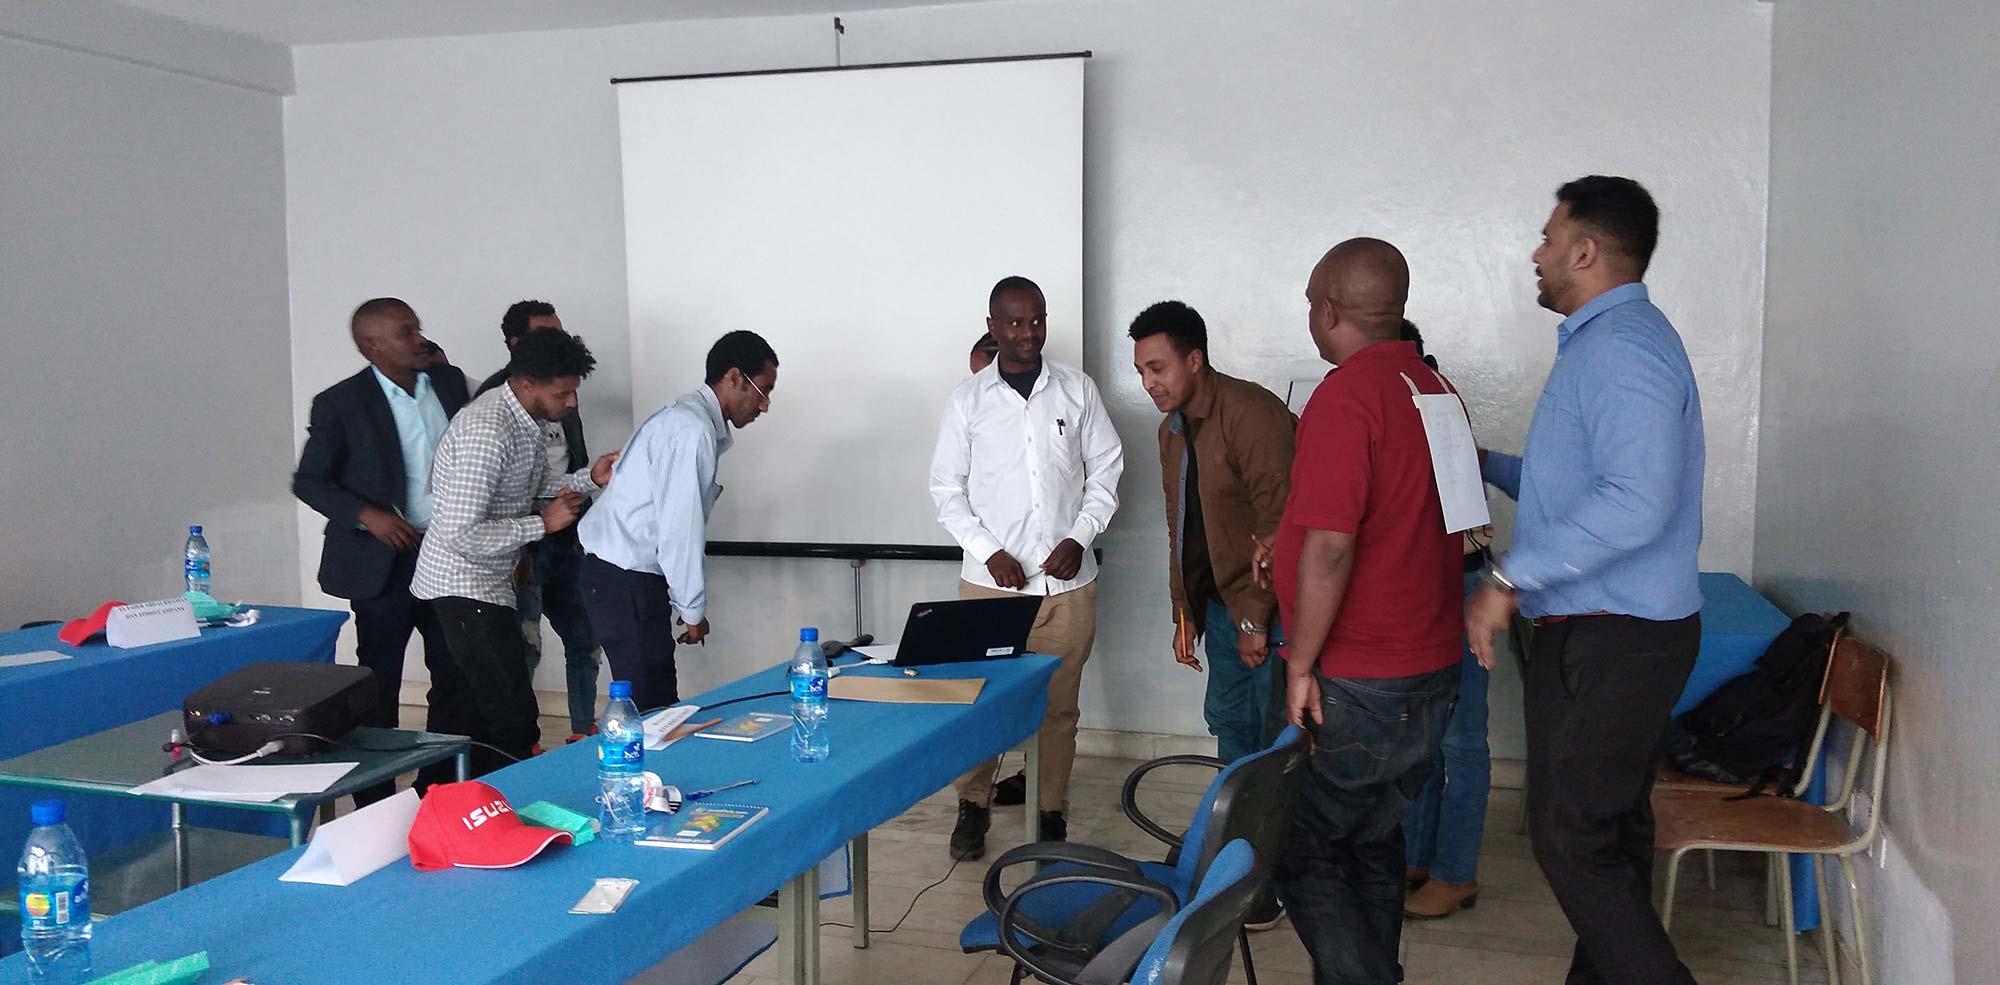 Isuzu East Africa Group activity professional appearance